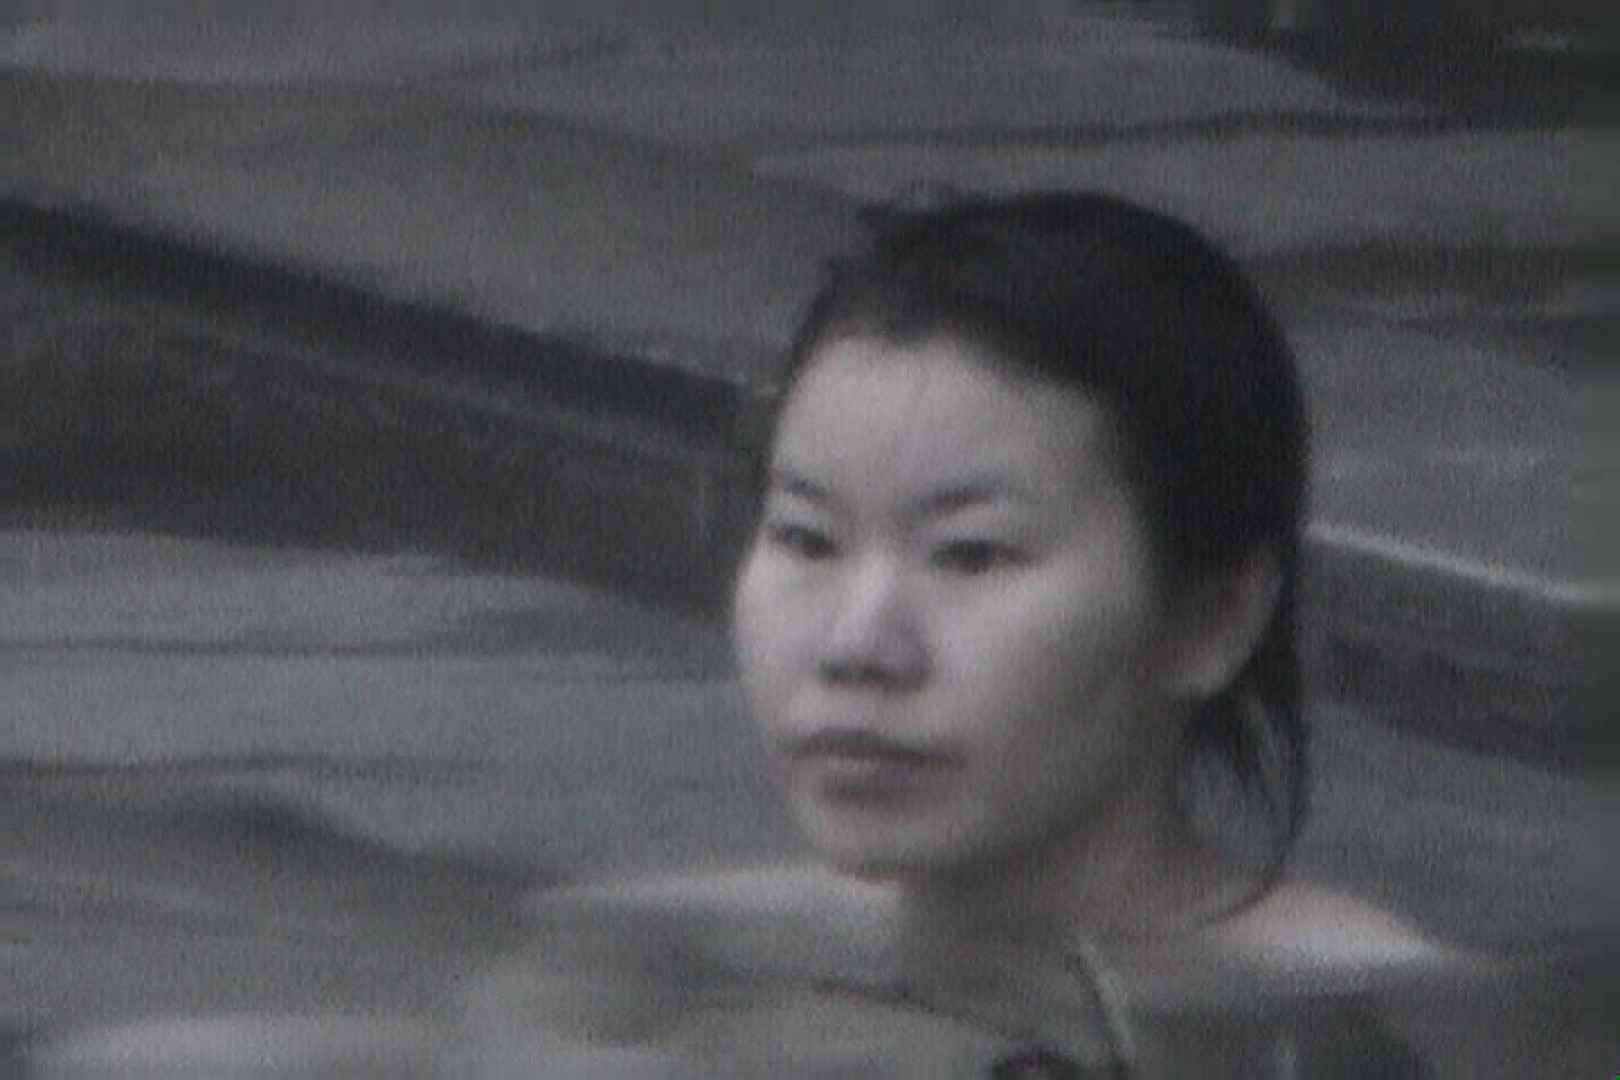 Aquaな露天風呂Vol.556 露天風呂編  99PIX 12